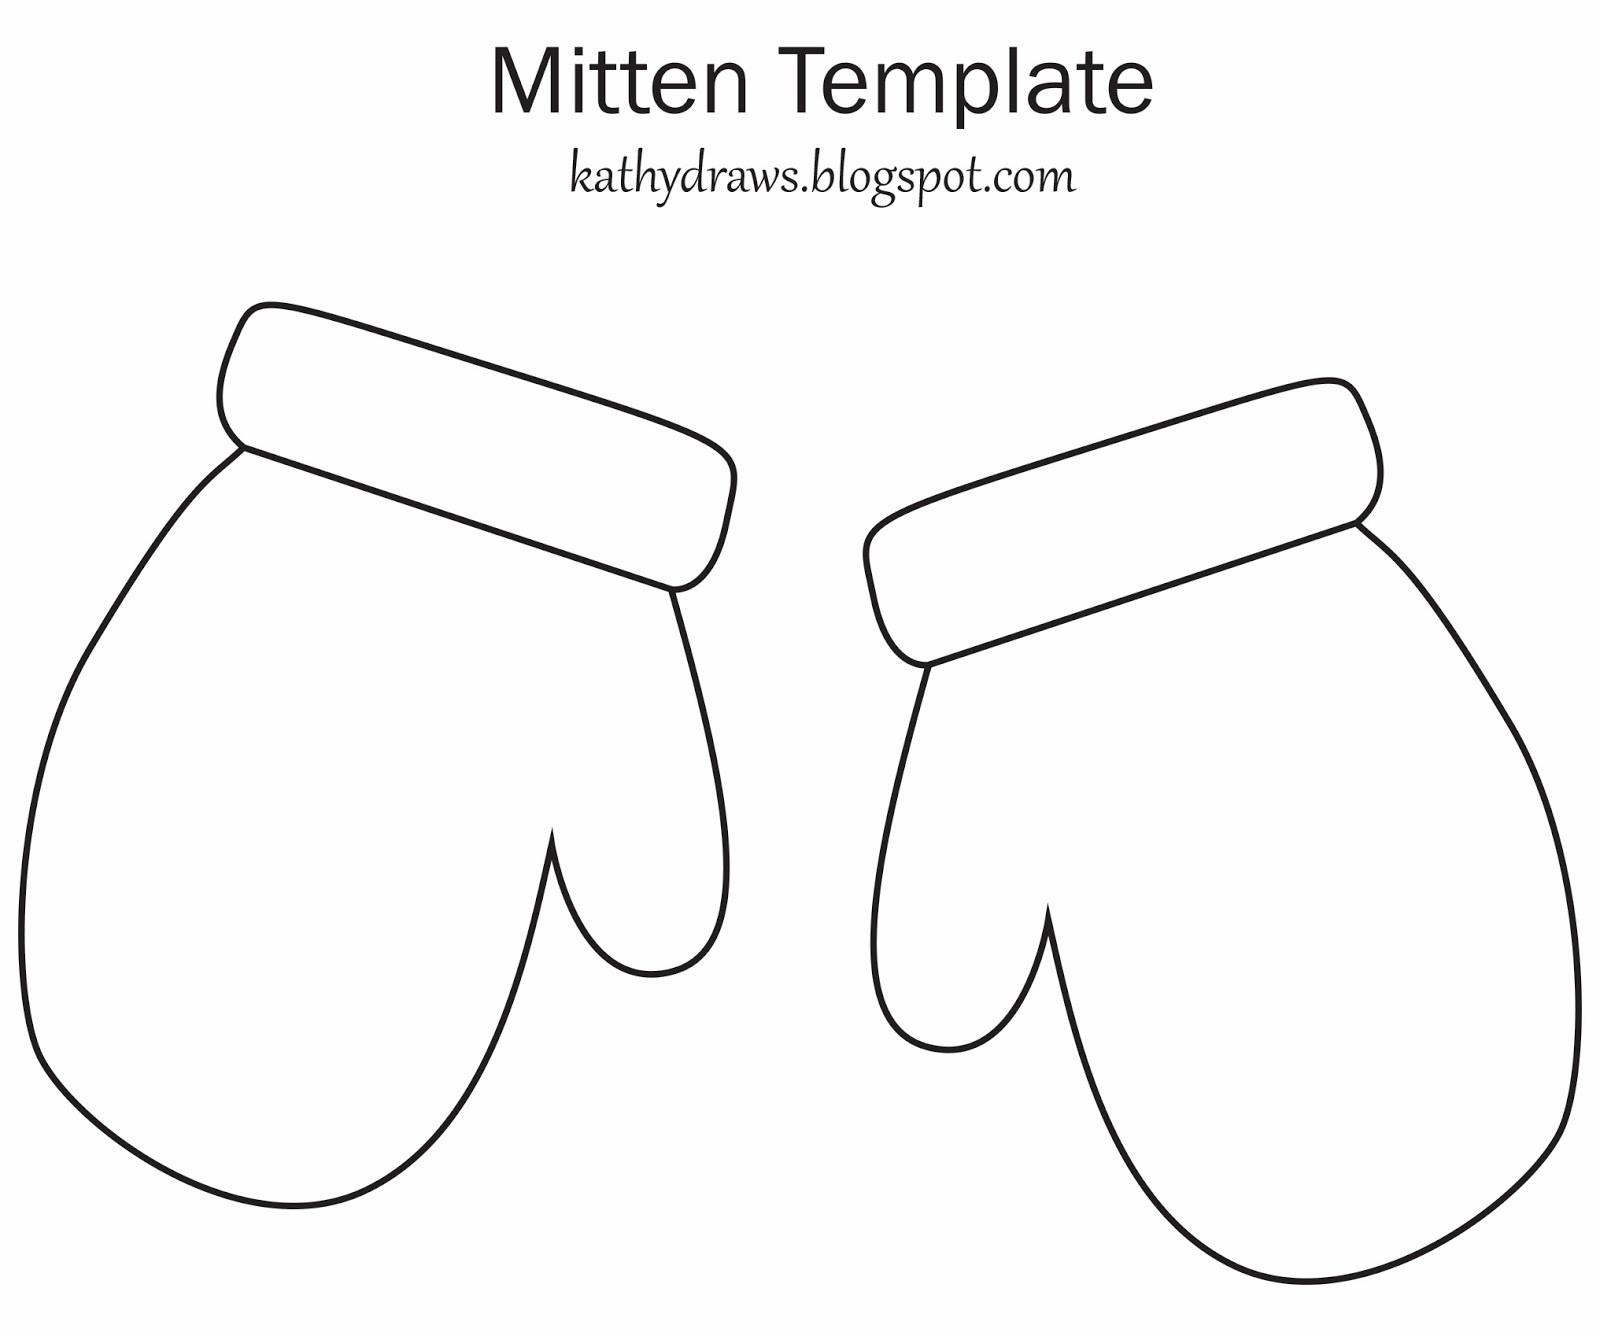 Mittens Template. Mittens Clipart Clipart Kid. Mittens Templates And - Free Mitten Template Printable